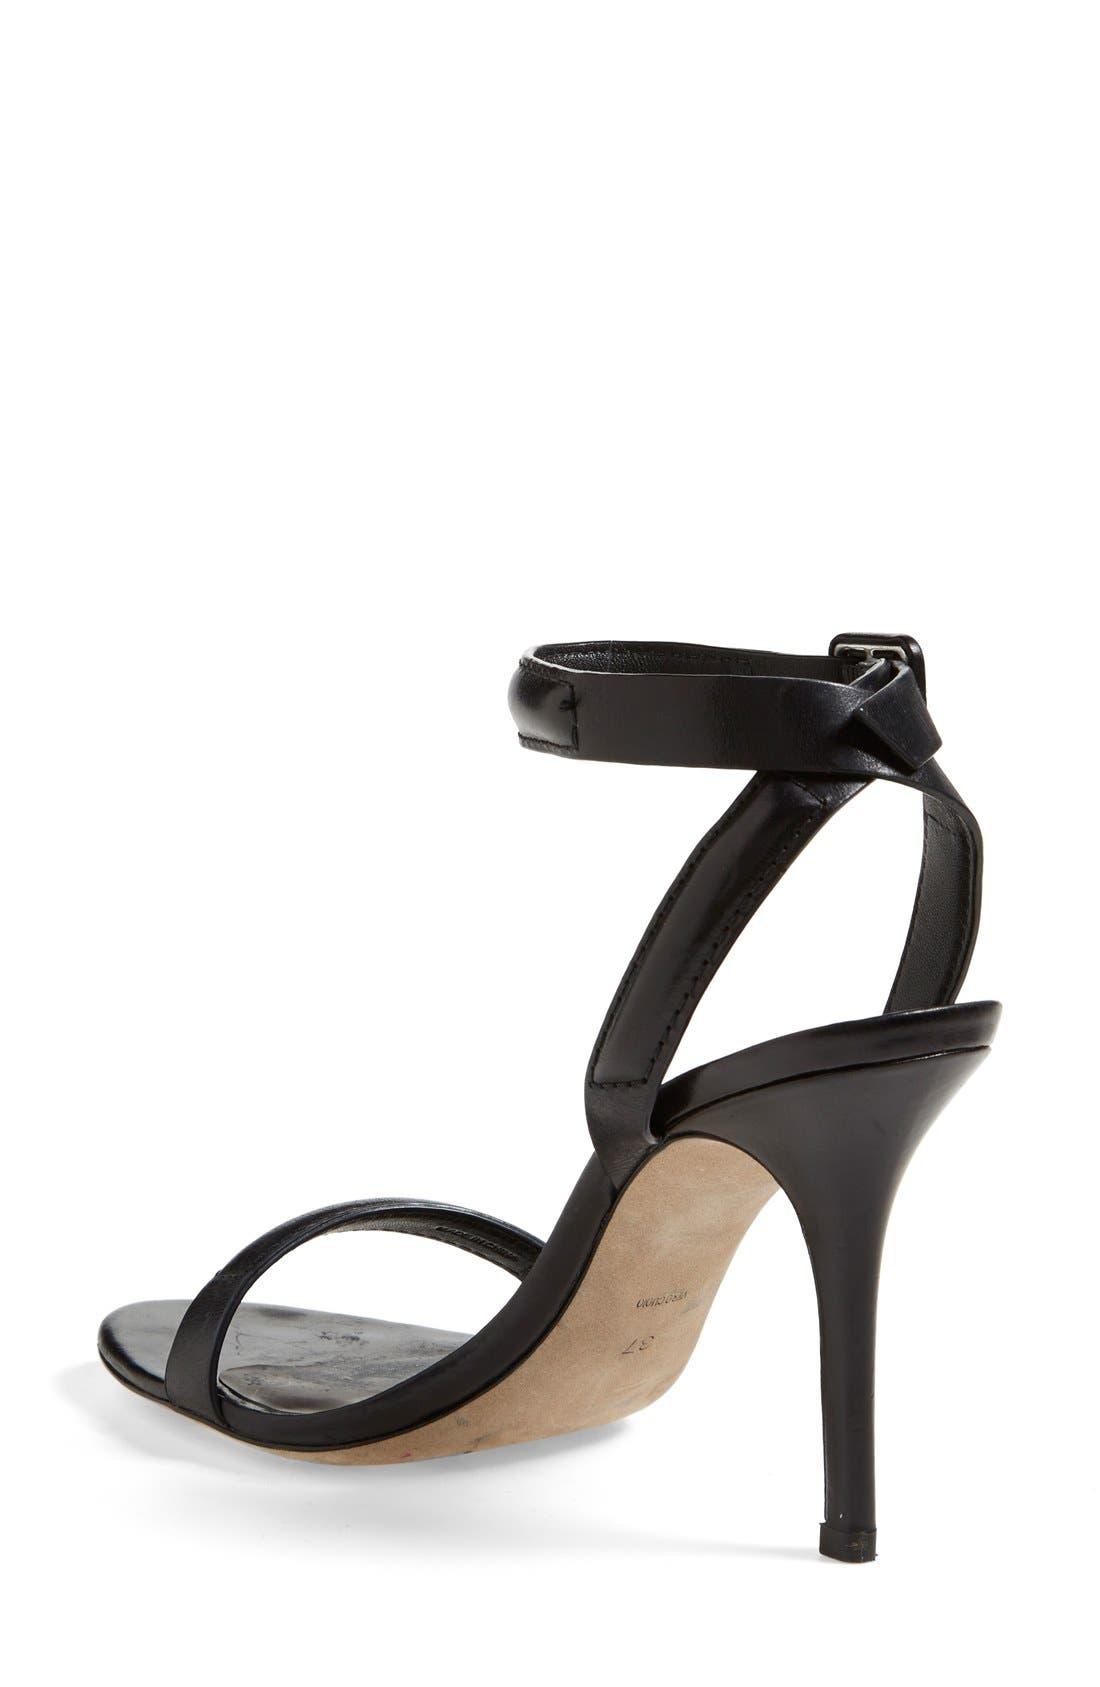 Alternate Image 2  - Alexander Wang 'Antonia' Ankle Strap Sandal (Women)